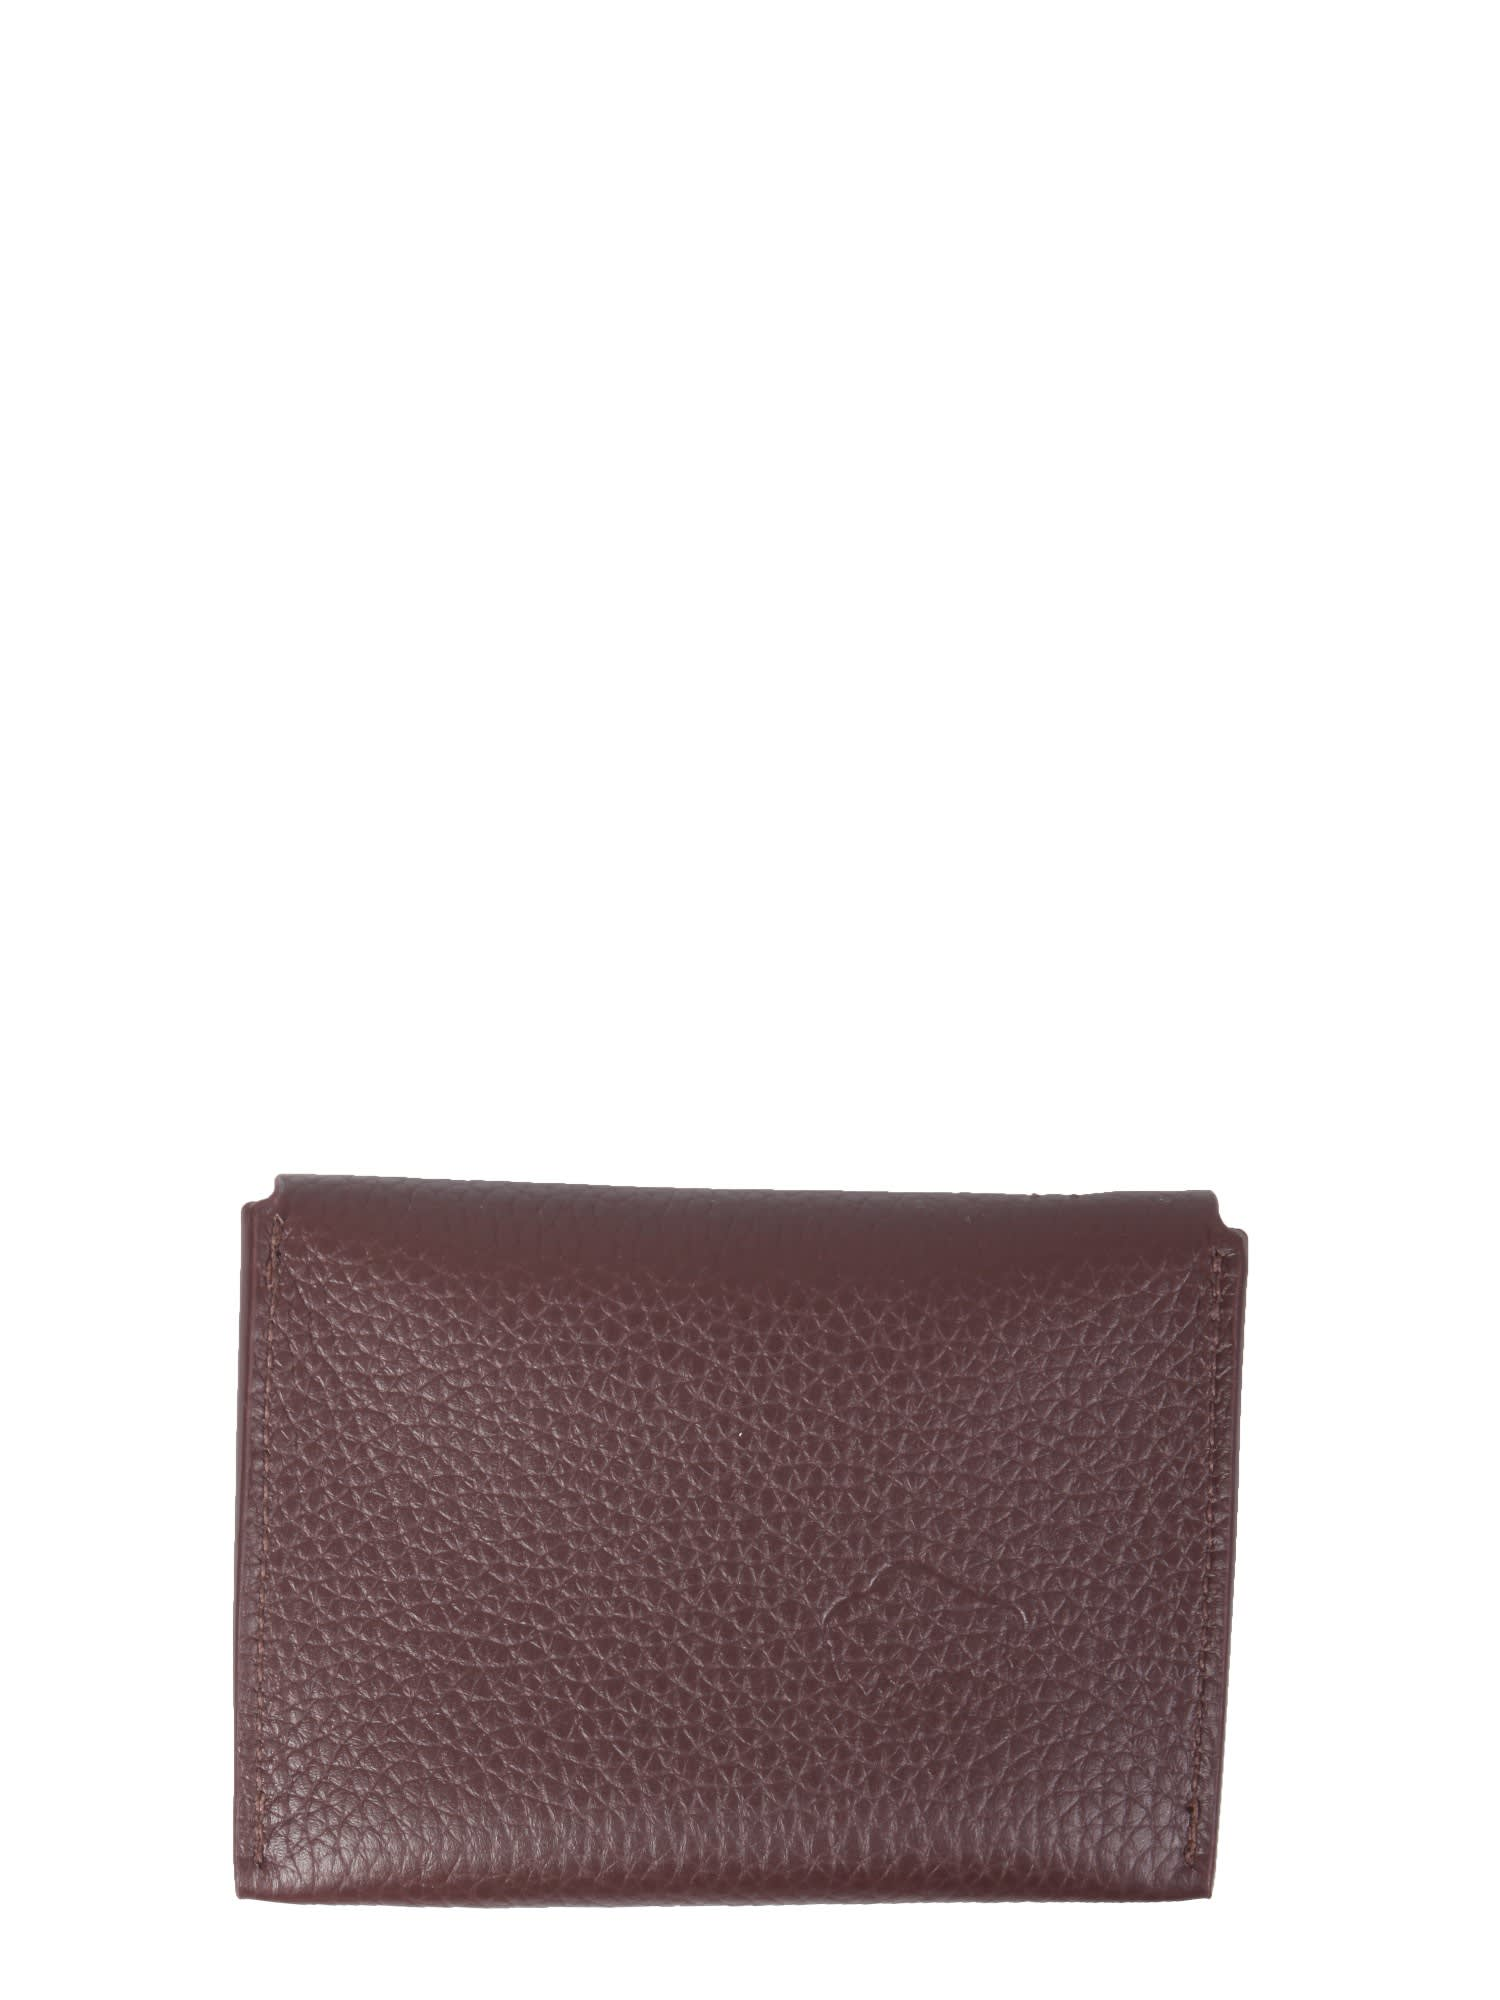 European Leather Card Holder